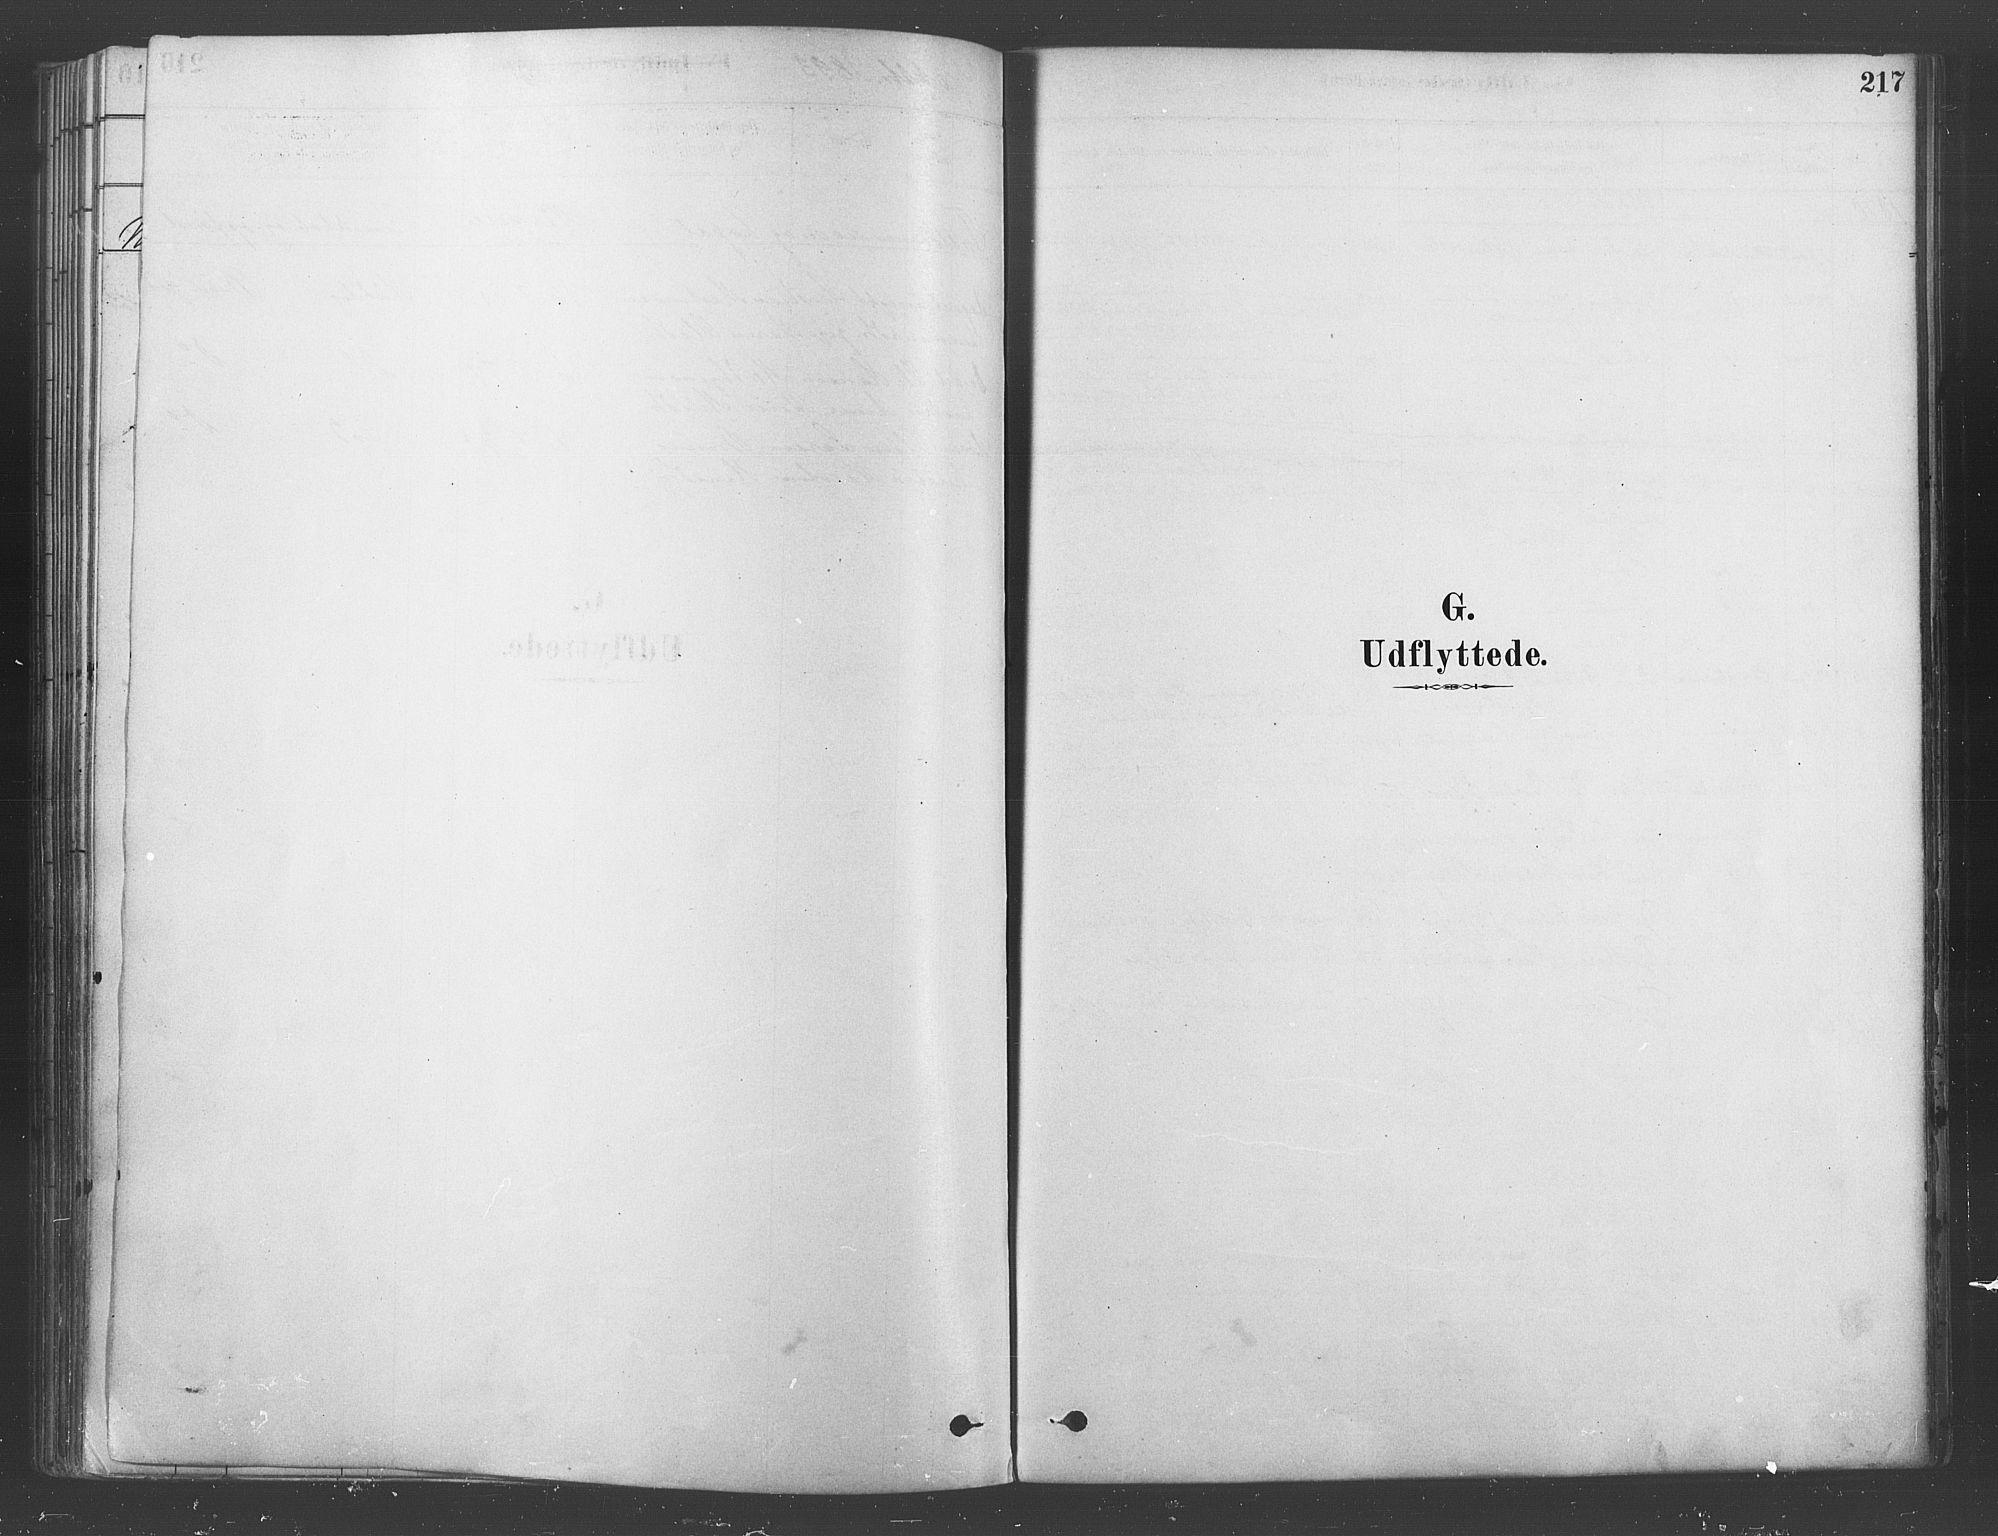 SAO, Ullensaker prestekontor Kirkebøker, F/Fb/L0001: Ministerialbok nr. II 1, 1878-1893, s. 217